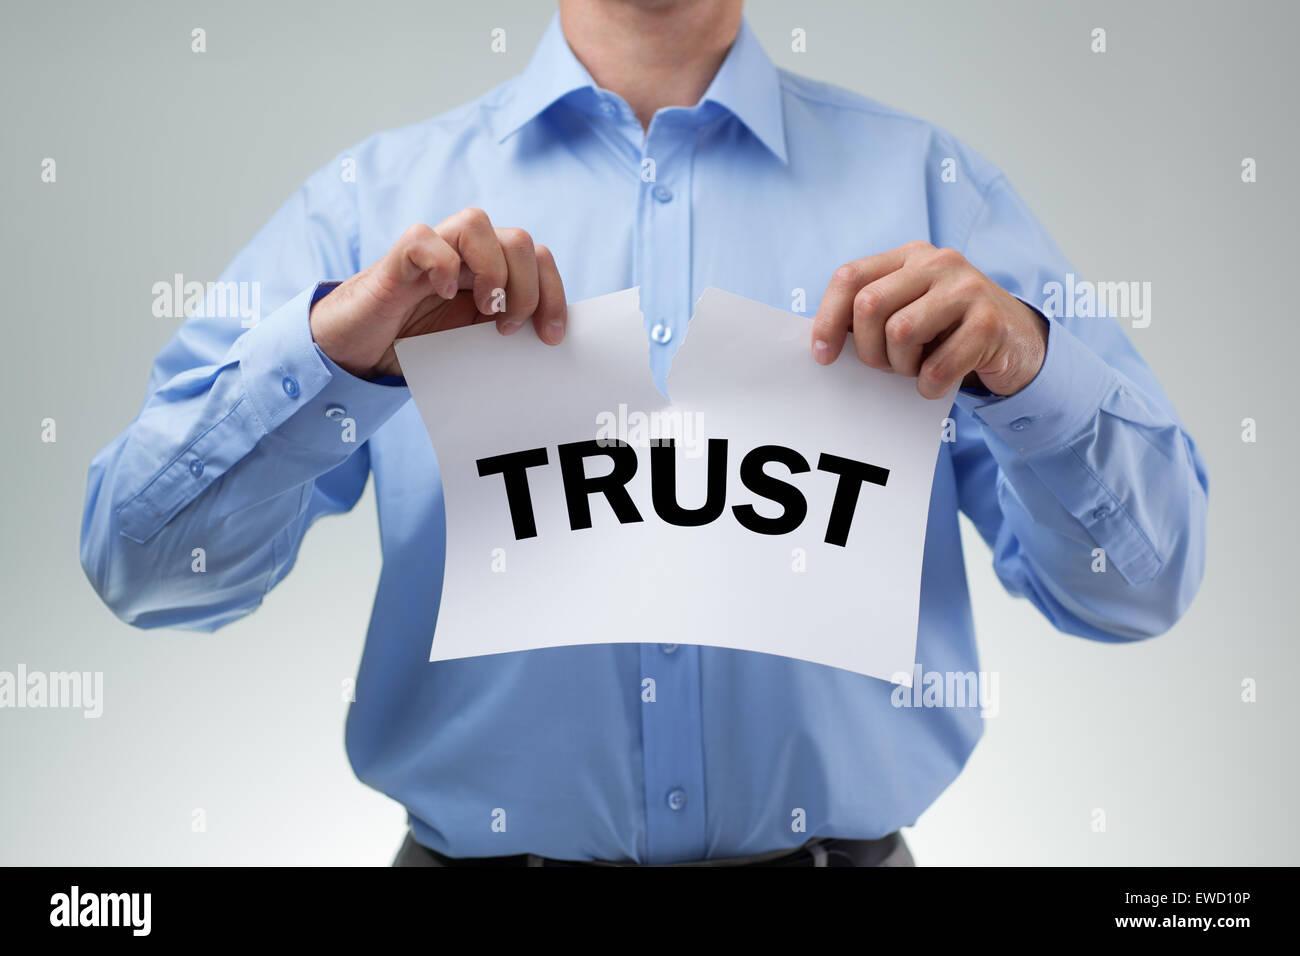 Gebrochene Vertrauen Stockbild